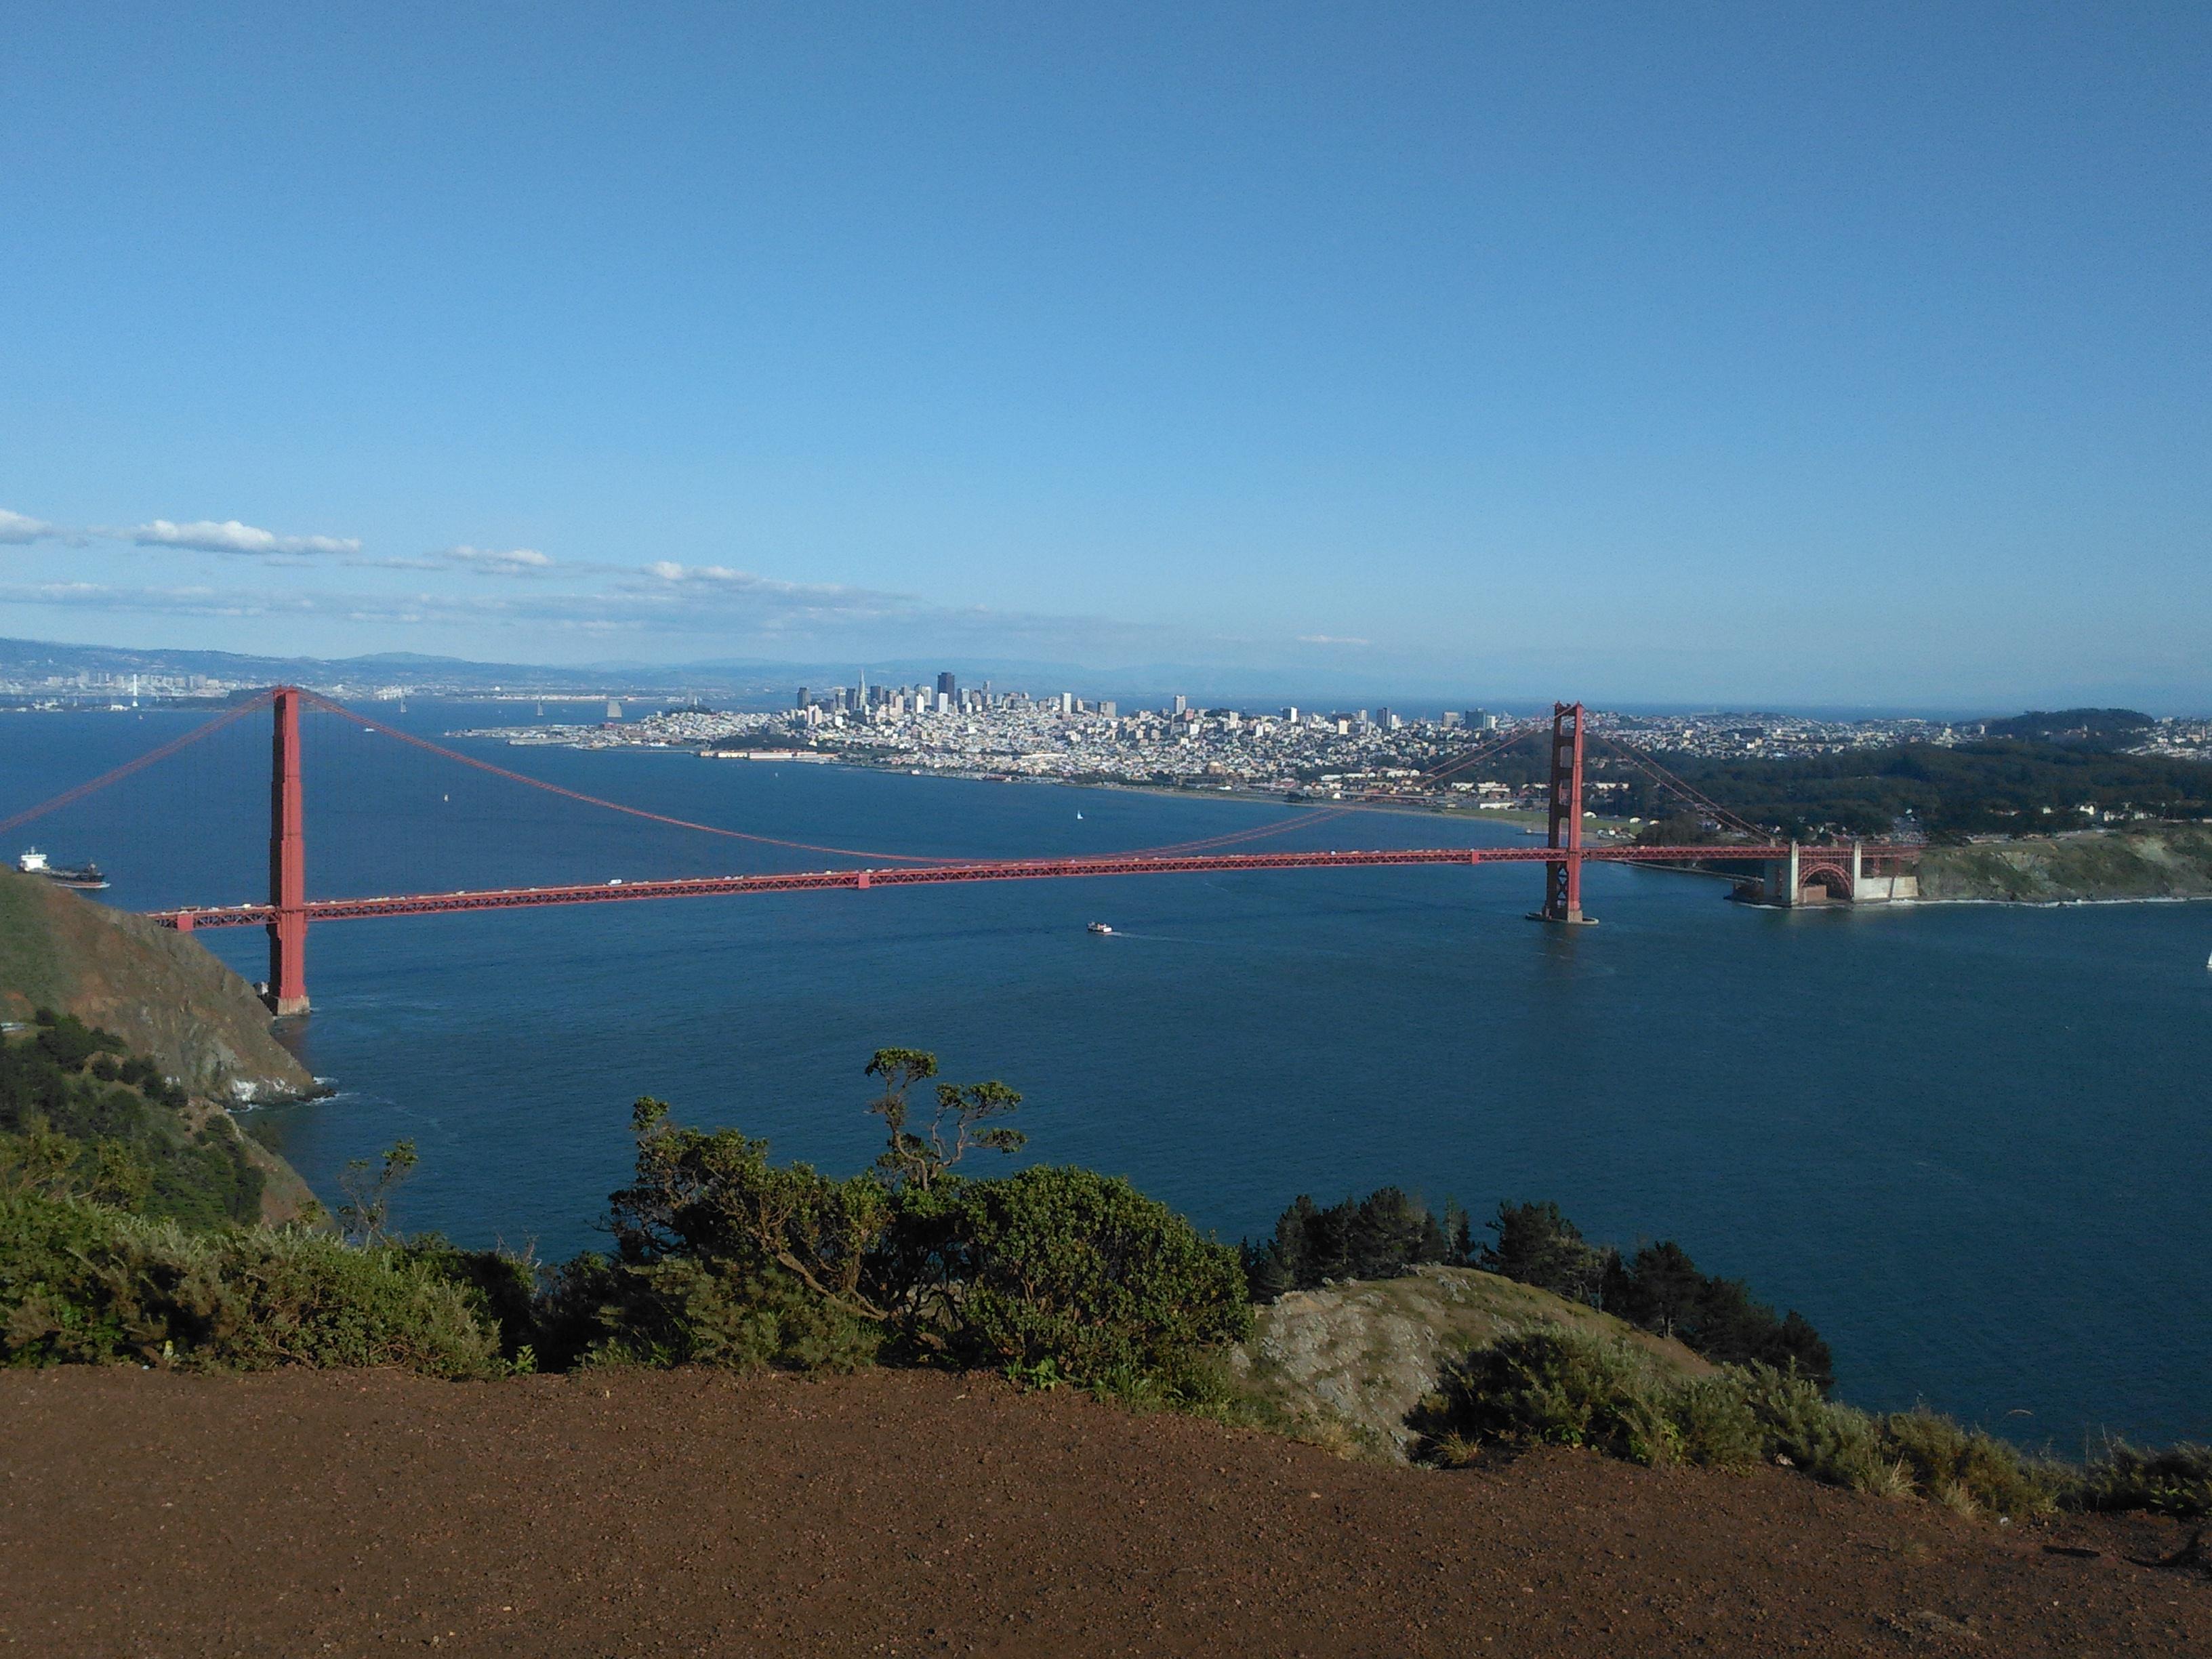 Une semaine au coeur de la capitale de l'innovation : La Silicon Valley